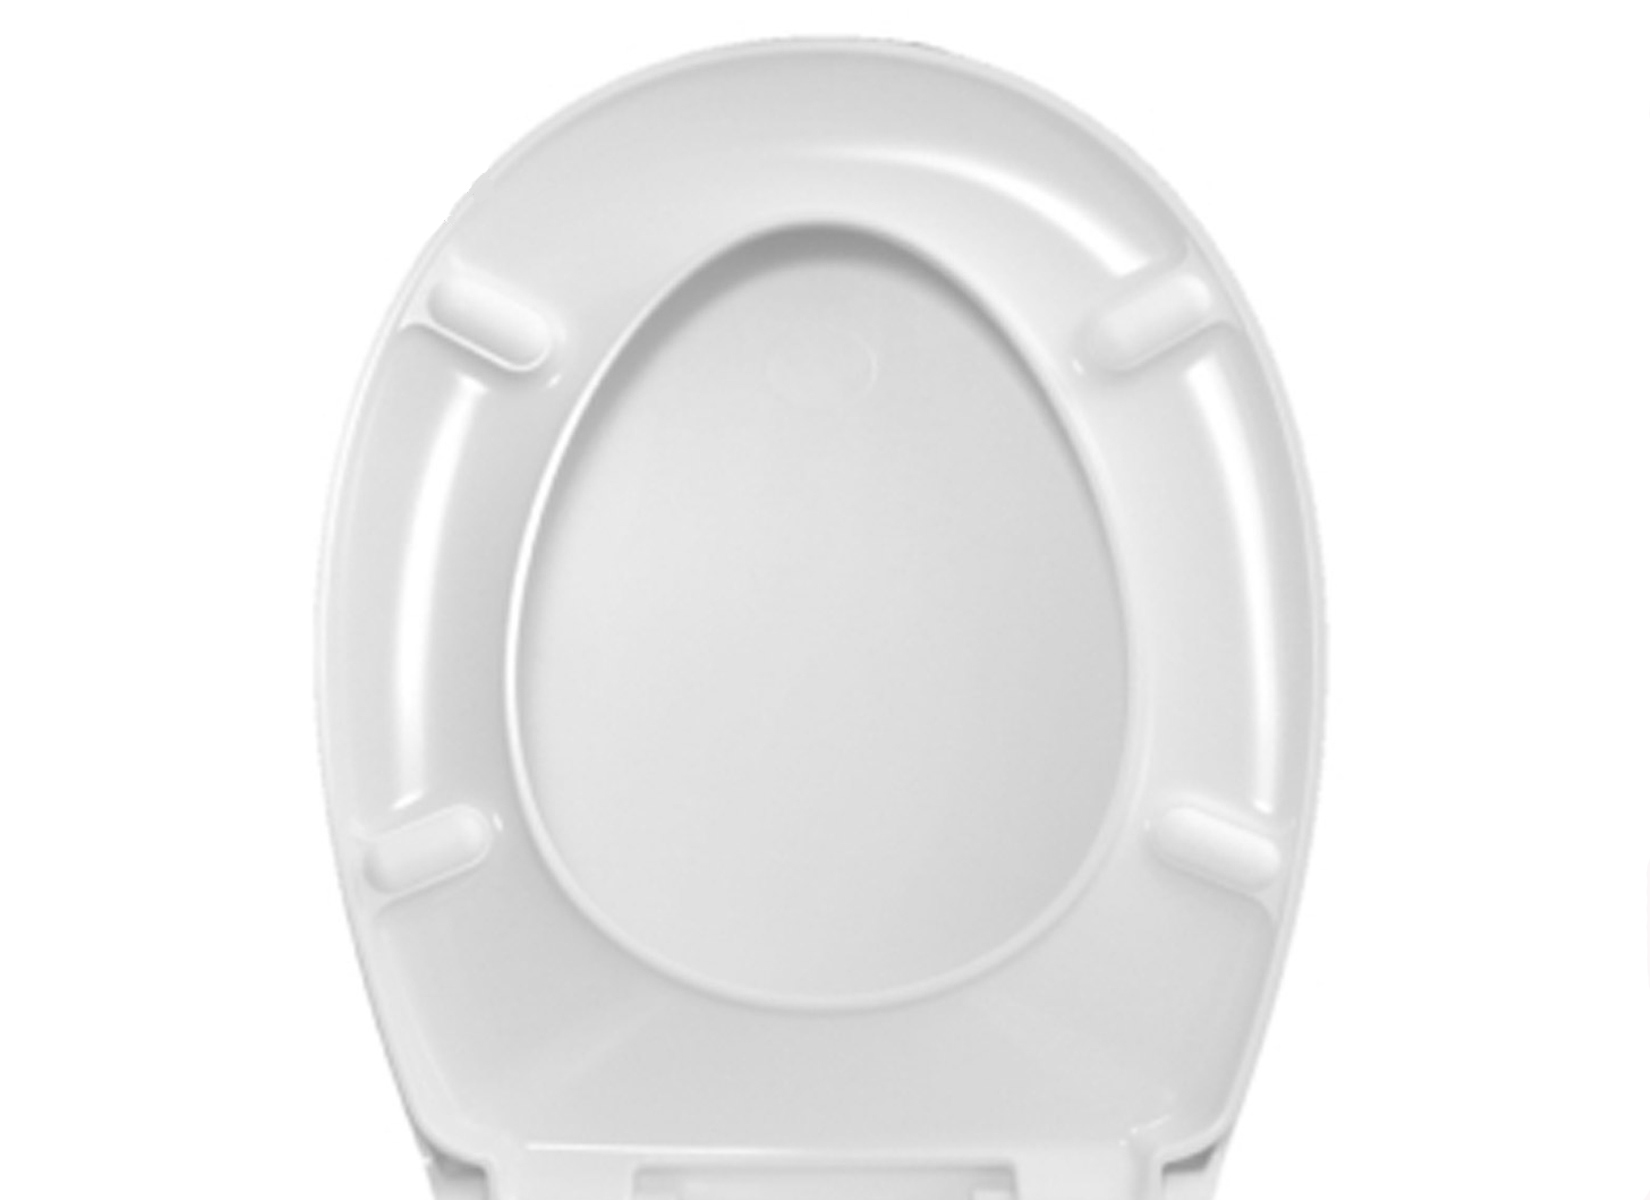 haro comfort wc sitz wei fastfix edelstahl deckel toilettensitz toilettendeckel ebay. Black Bedroom Furniture Sets. Home Design Ideas